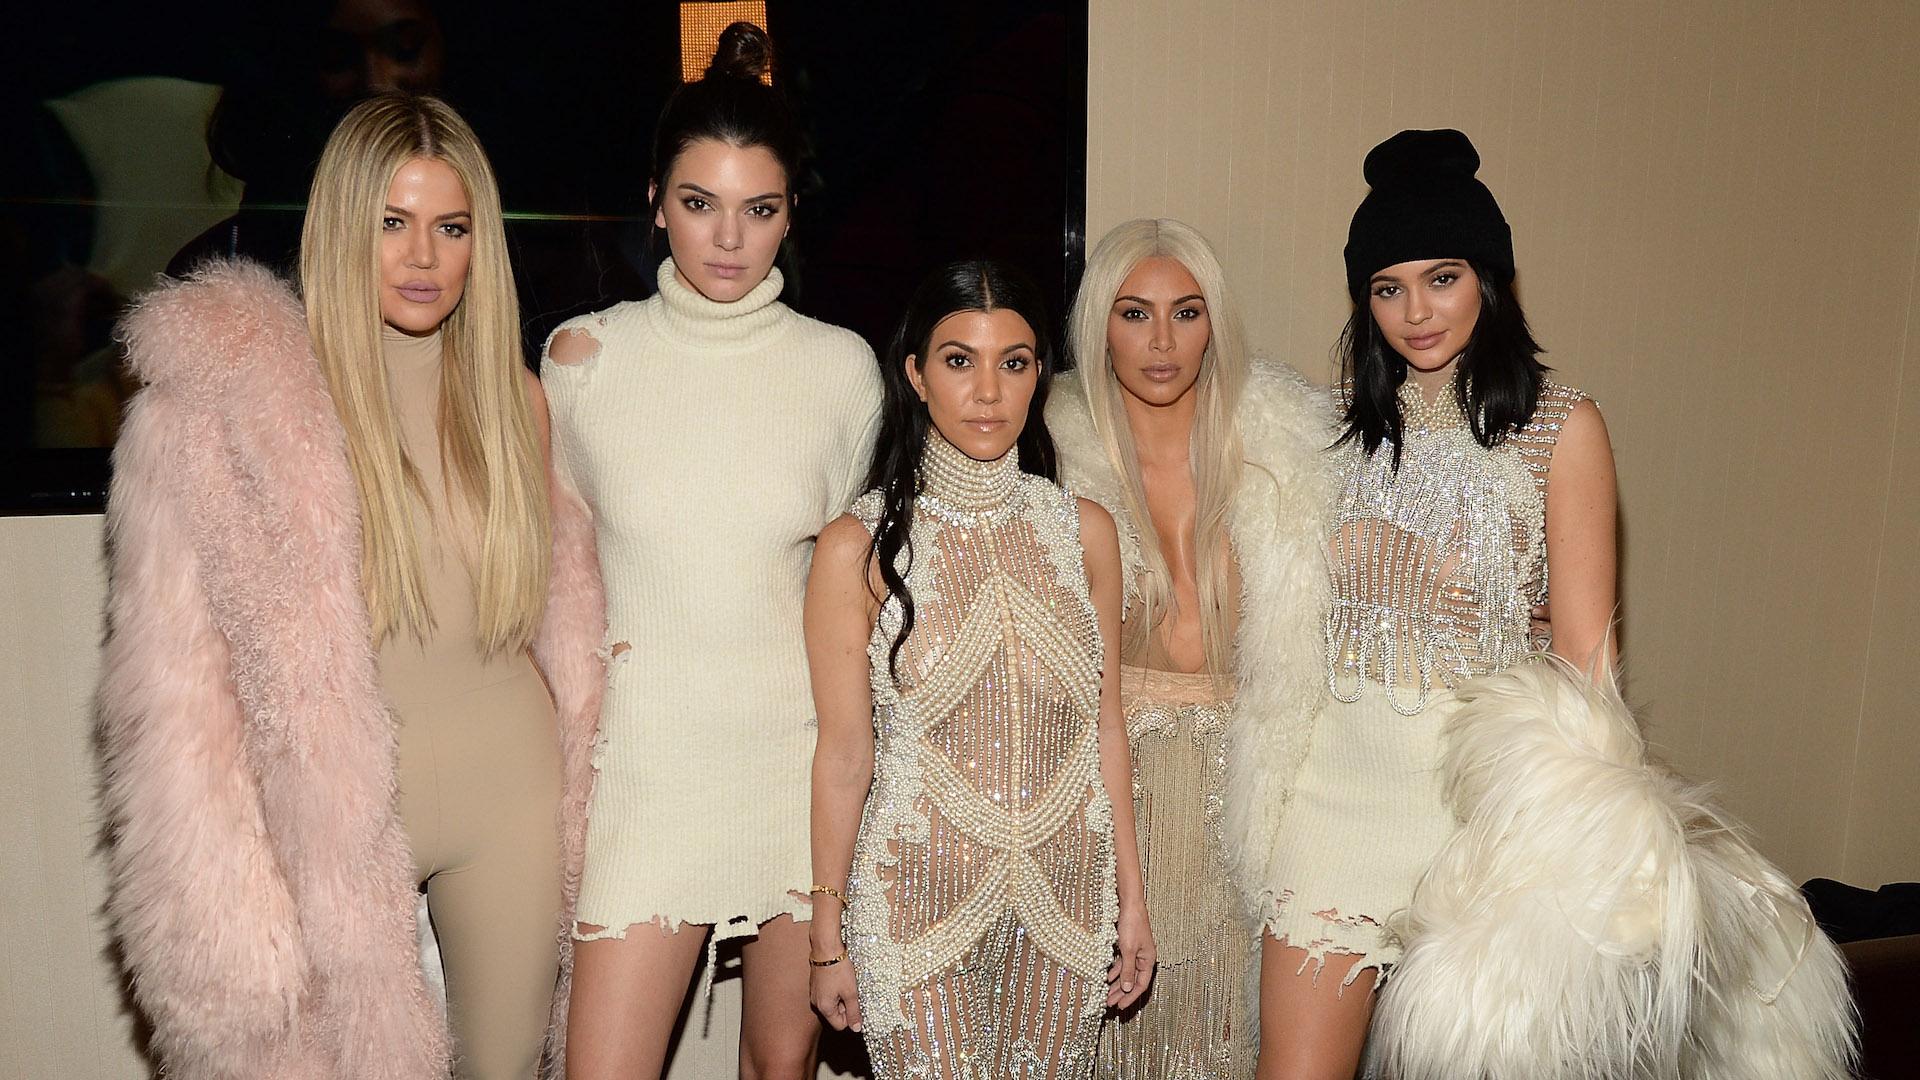 Here's What Led to Kim and Kourtney Kardashian Fighting on 'KUWTK'